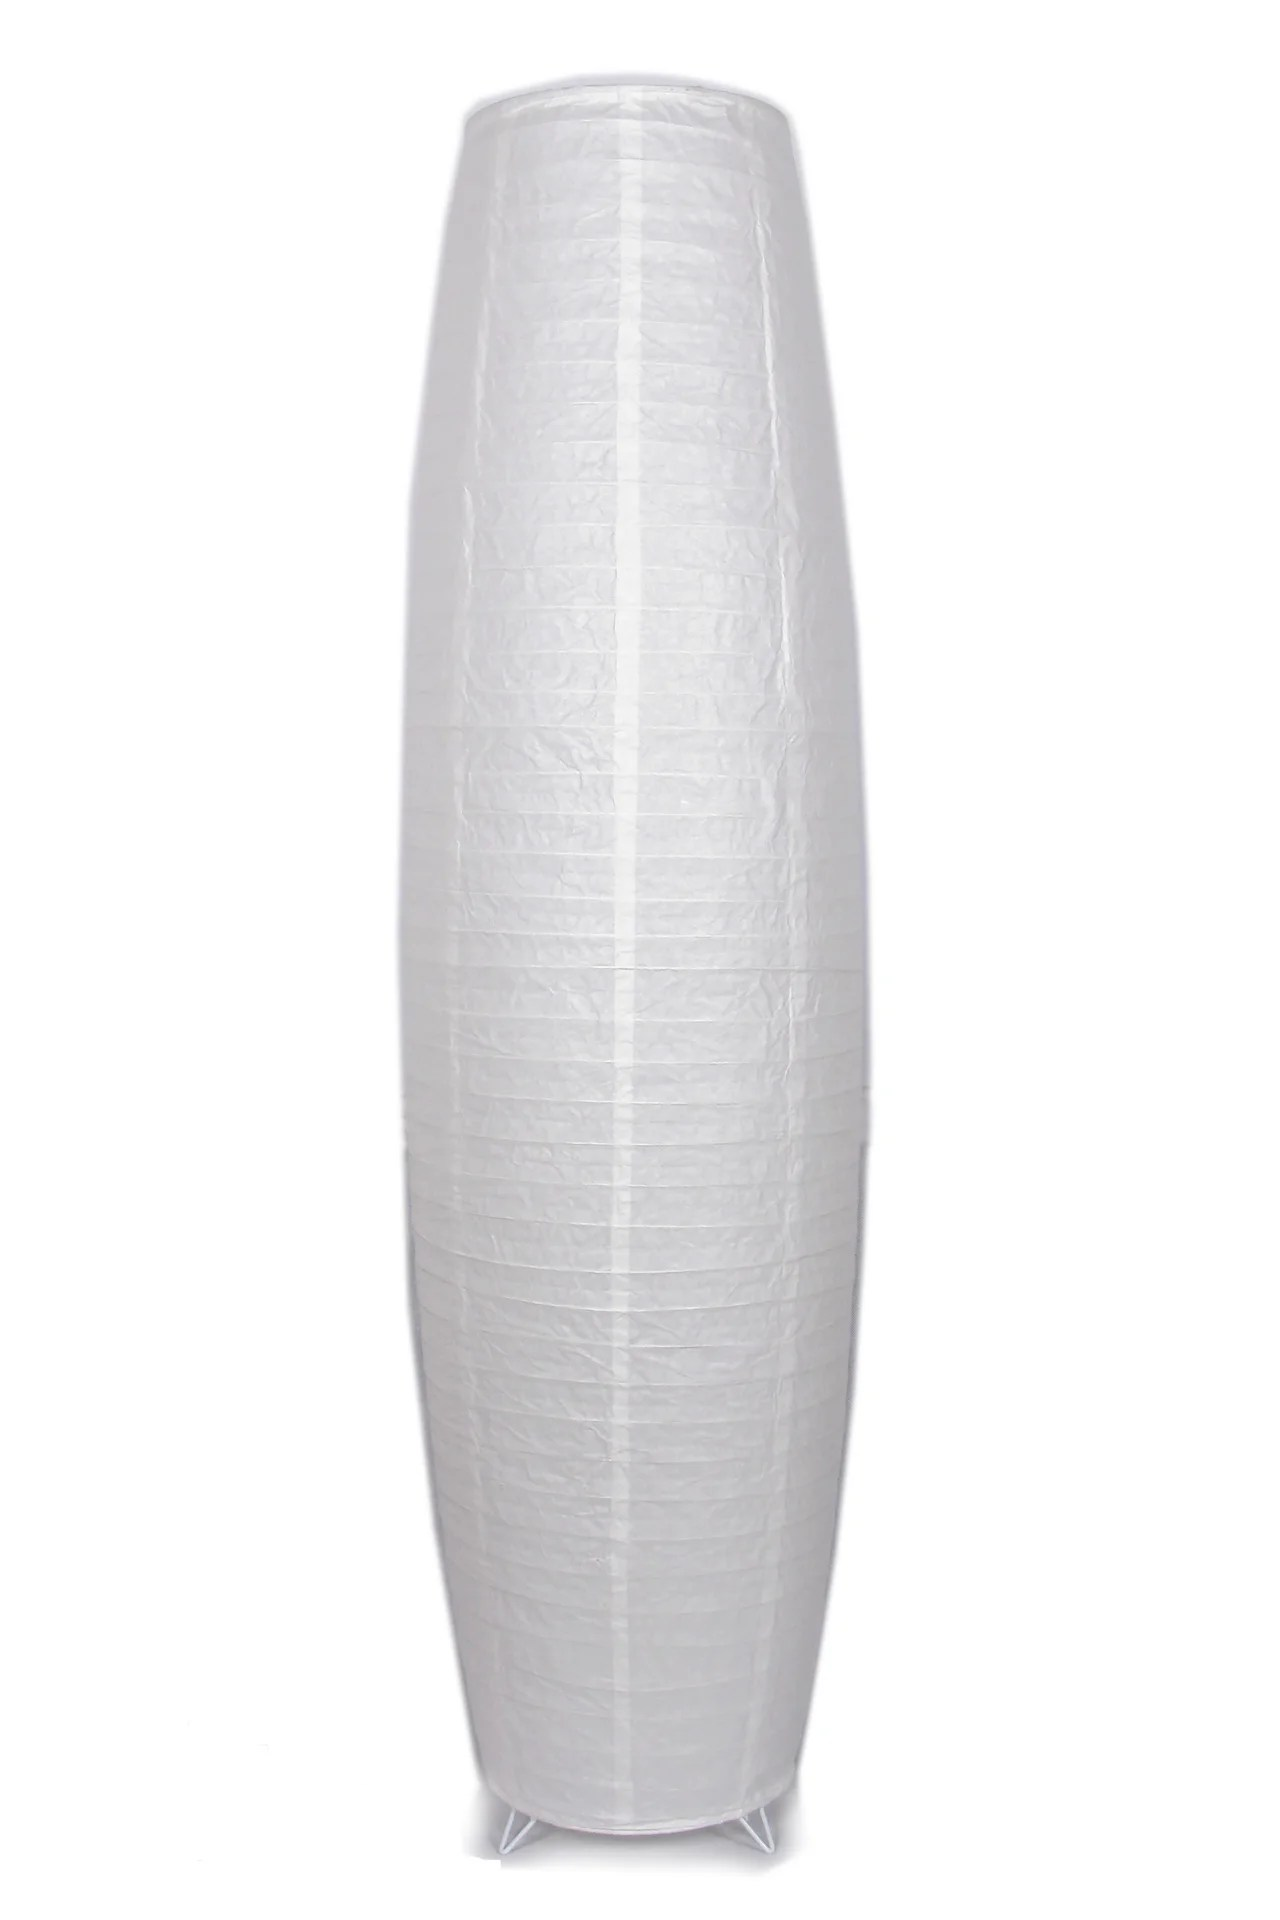 Abat Jour Anjo H 160 Cm Diam 36 Cm Papier Blanc Leroy Merlin